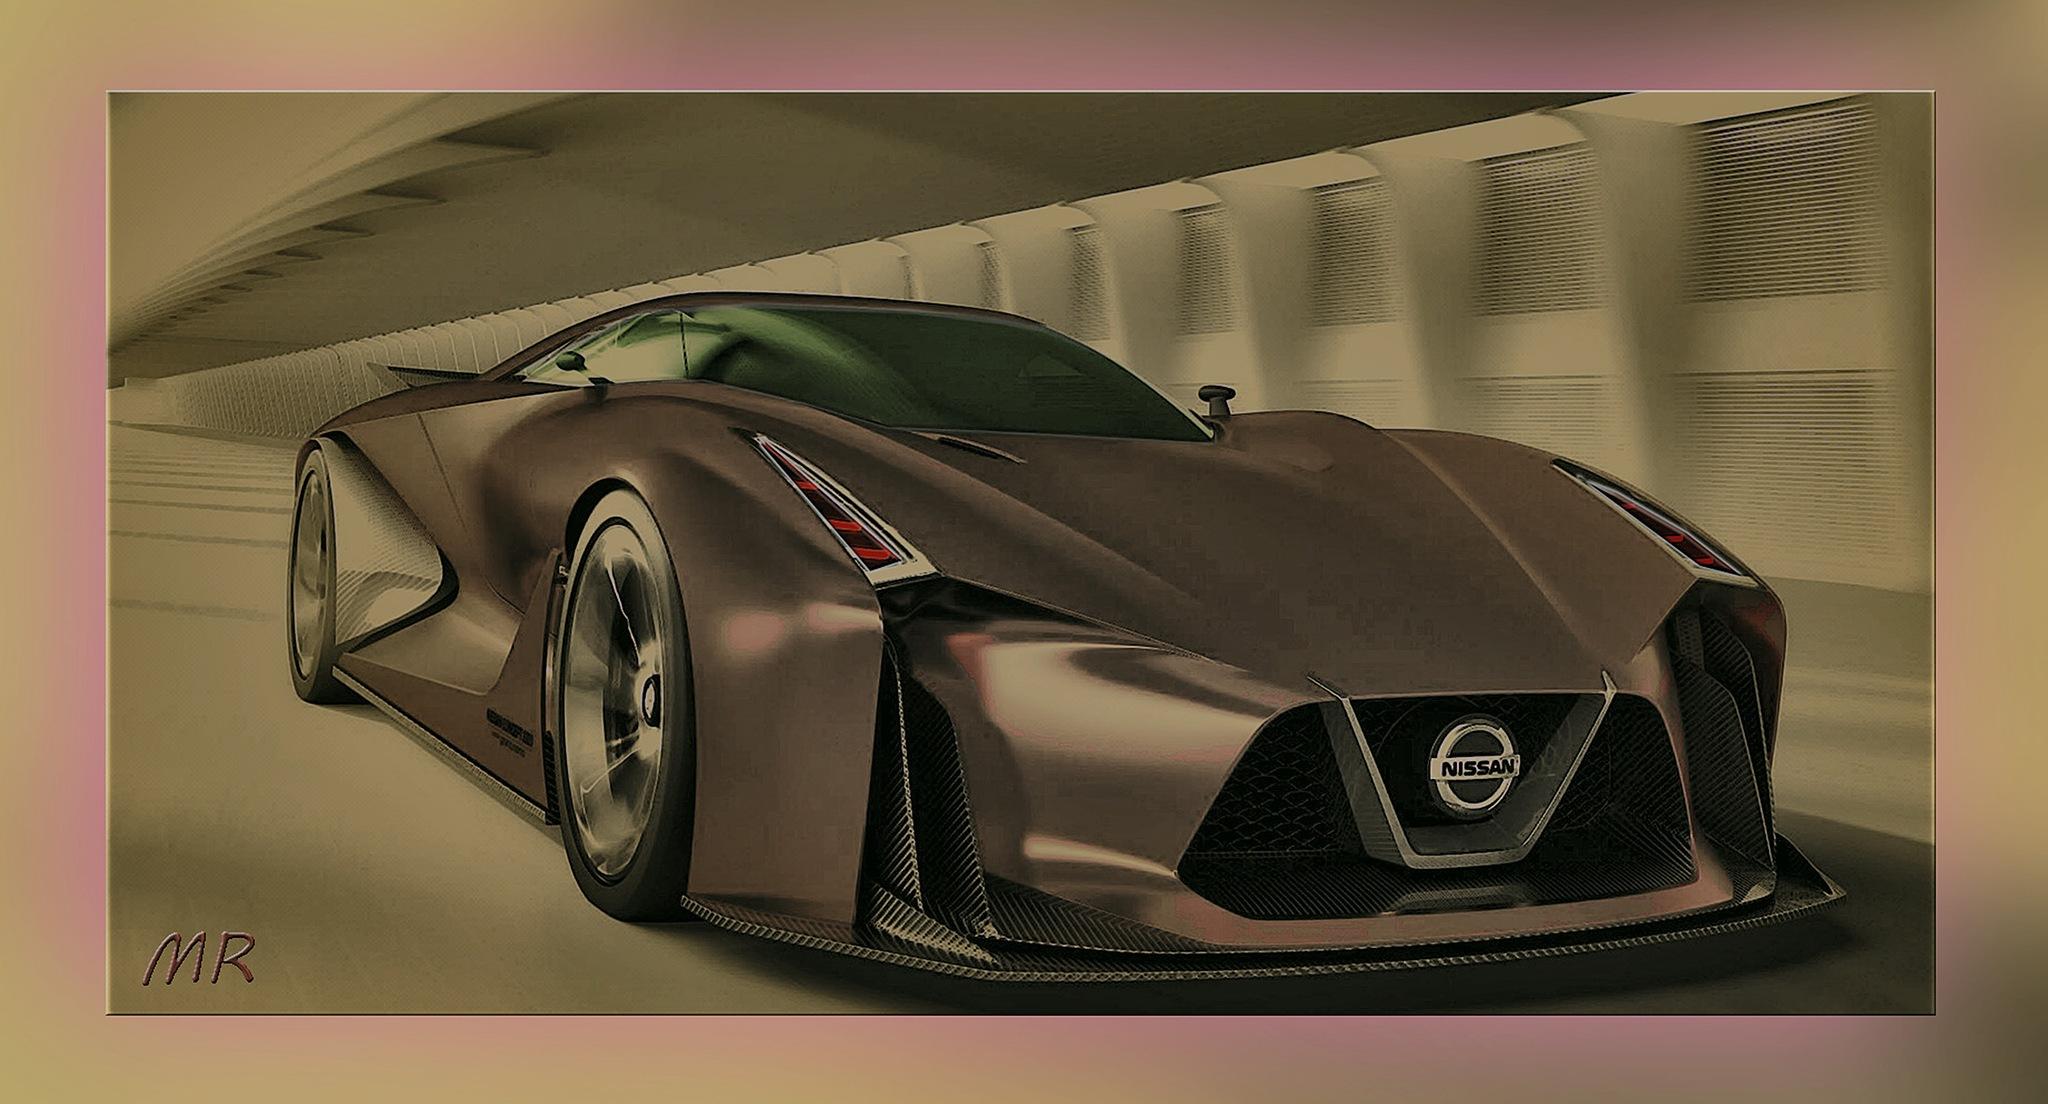 Nissan by Mikael Rennerhorn